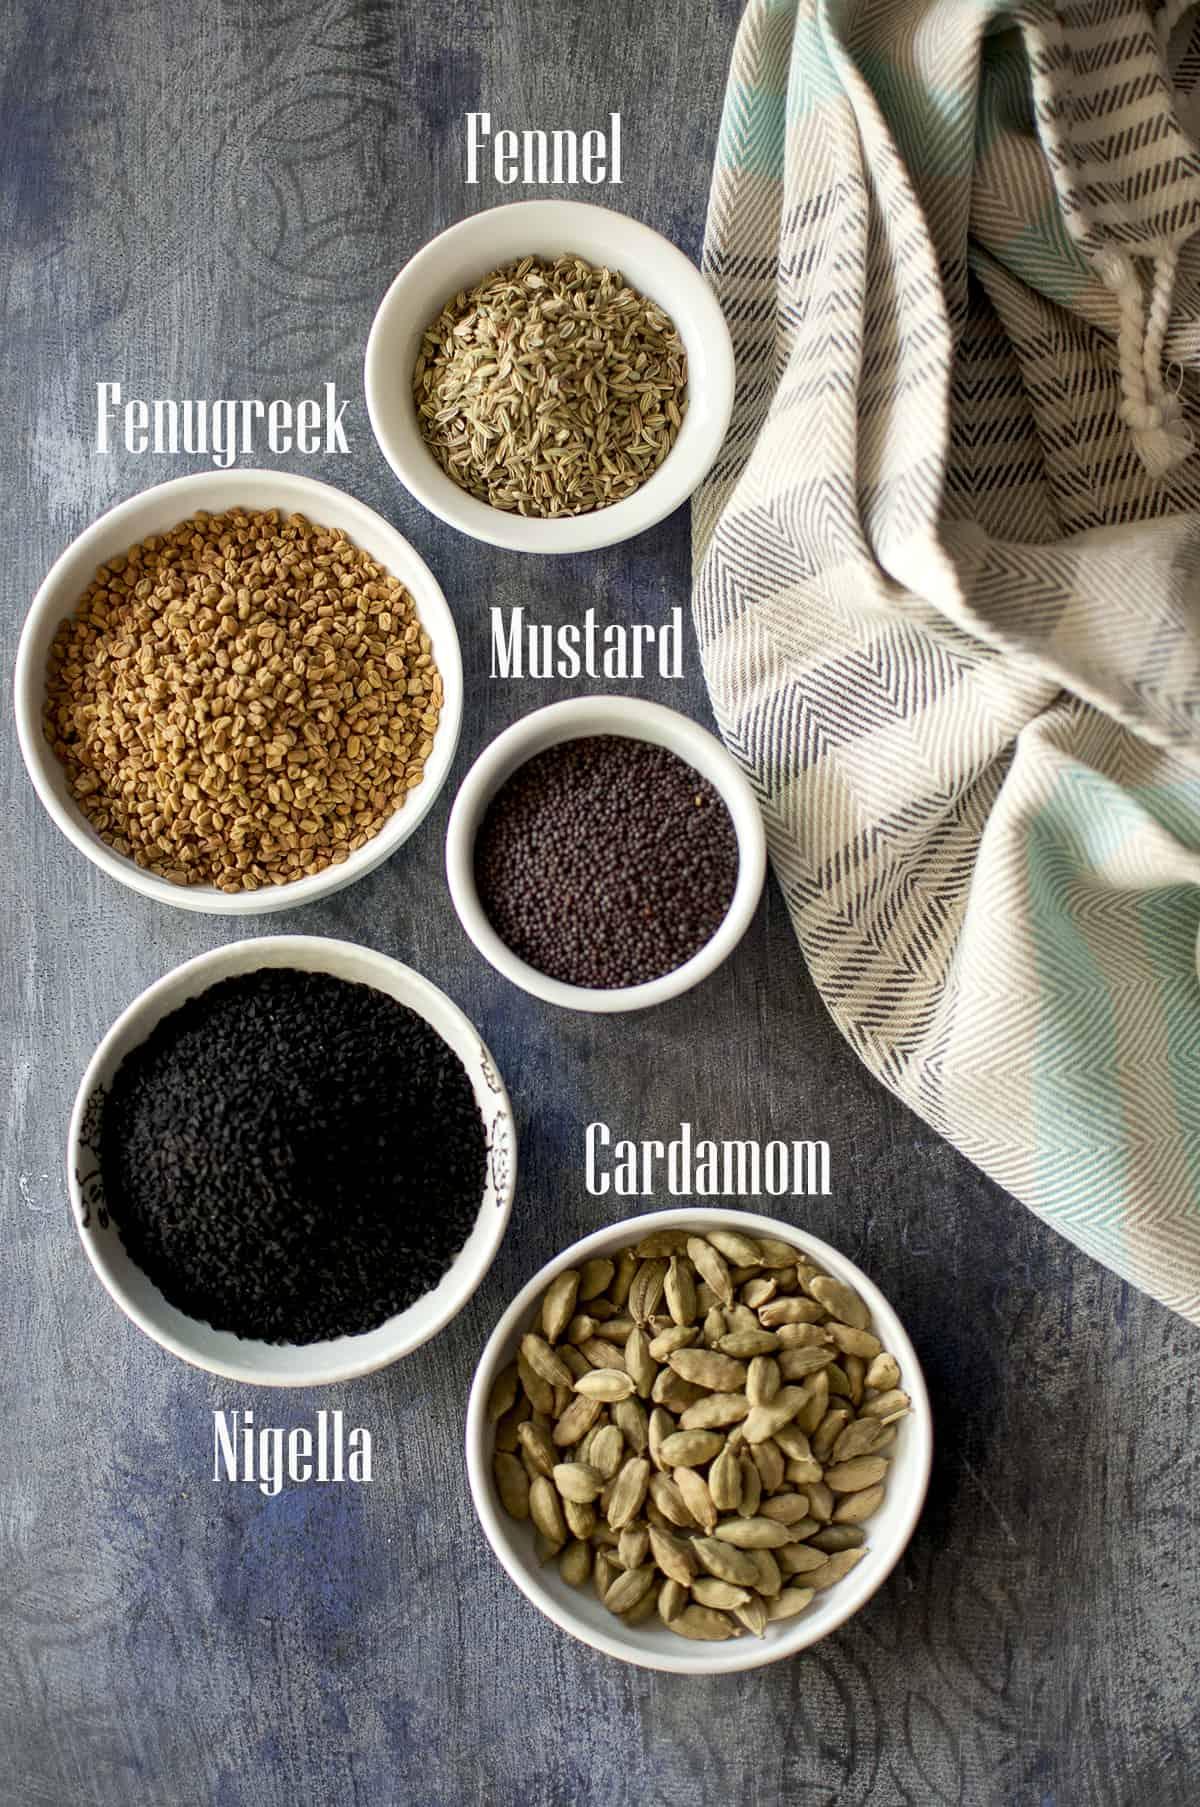 Spiced needed for the recipe placed in white bowls - Fennel, fenugreek, mustard, nigella, cardamom